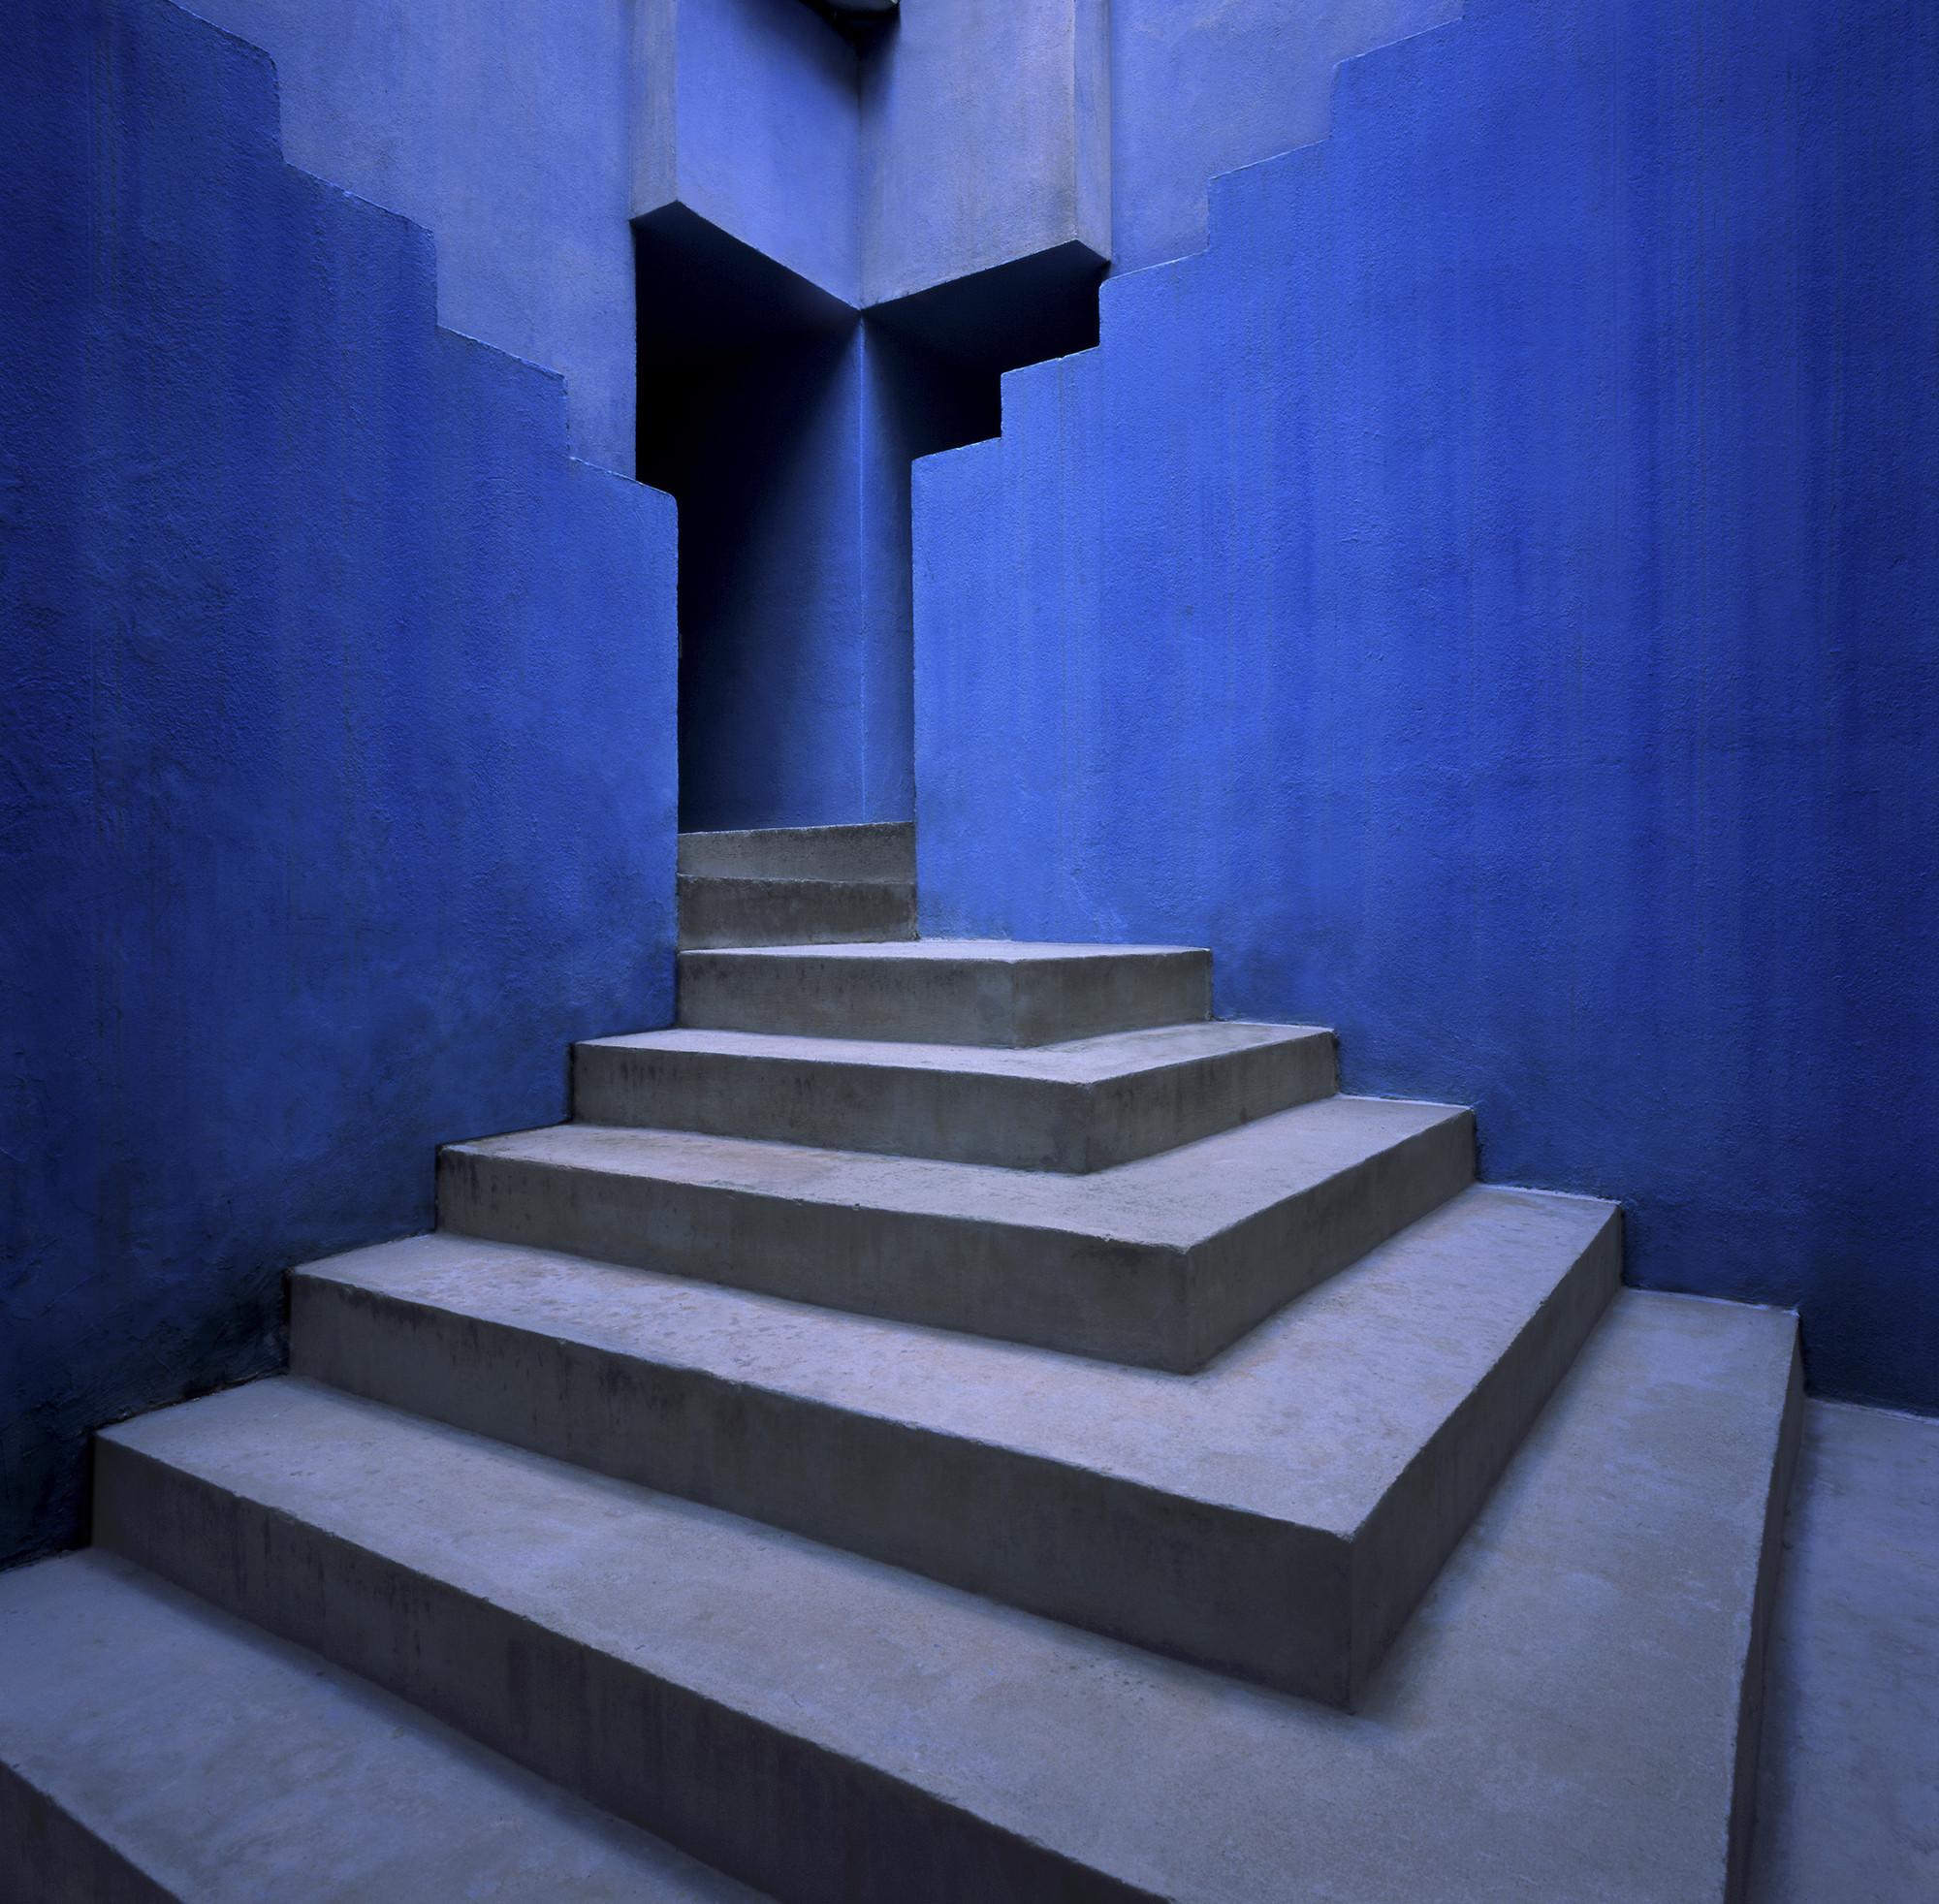 Ricardo_Bofill_Taller_de_Arquitectura_La_Muralla_Roja_Calpe_Spain_(8)